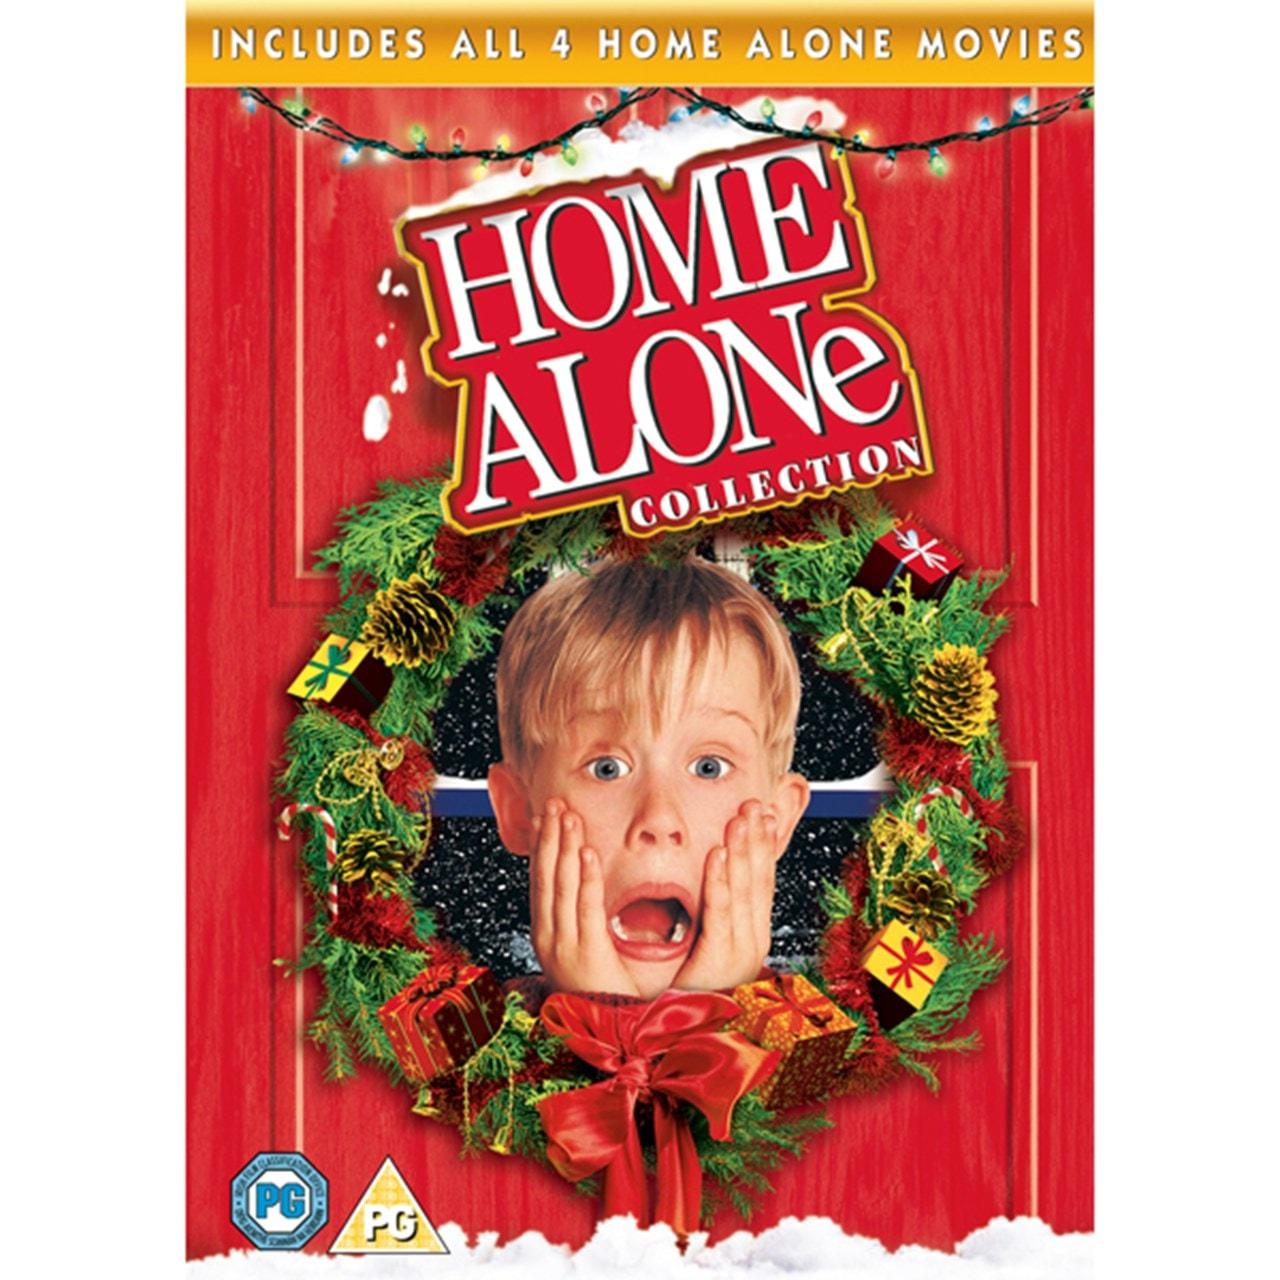 Home Alone/Home Alone 2 /Home Alone 3/Home Alone 4 - 1